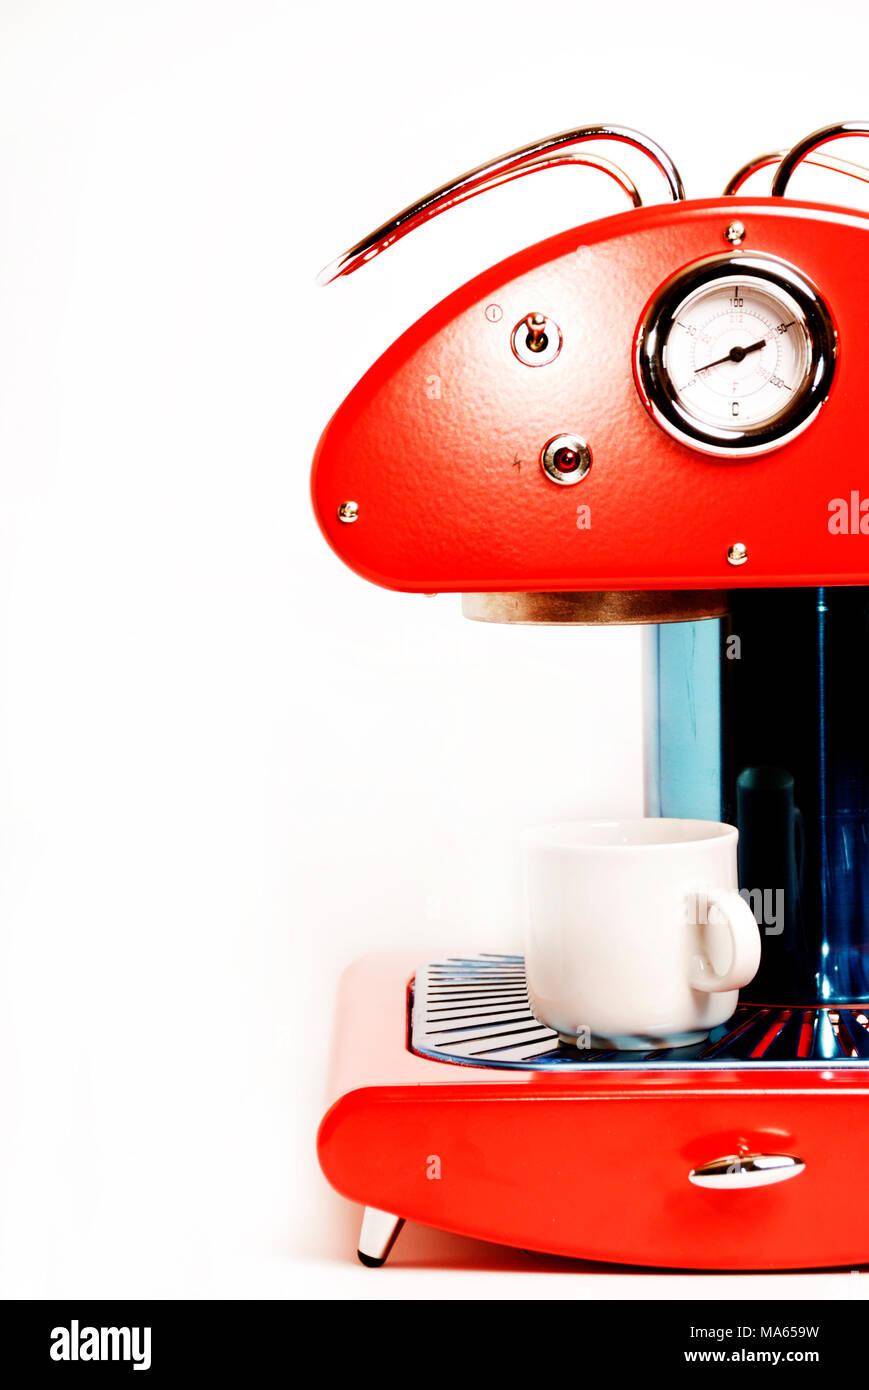 Retro Red Coffee Maker Stock Photo 178386149 Alamy